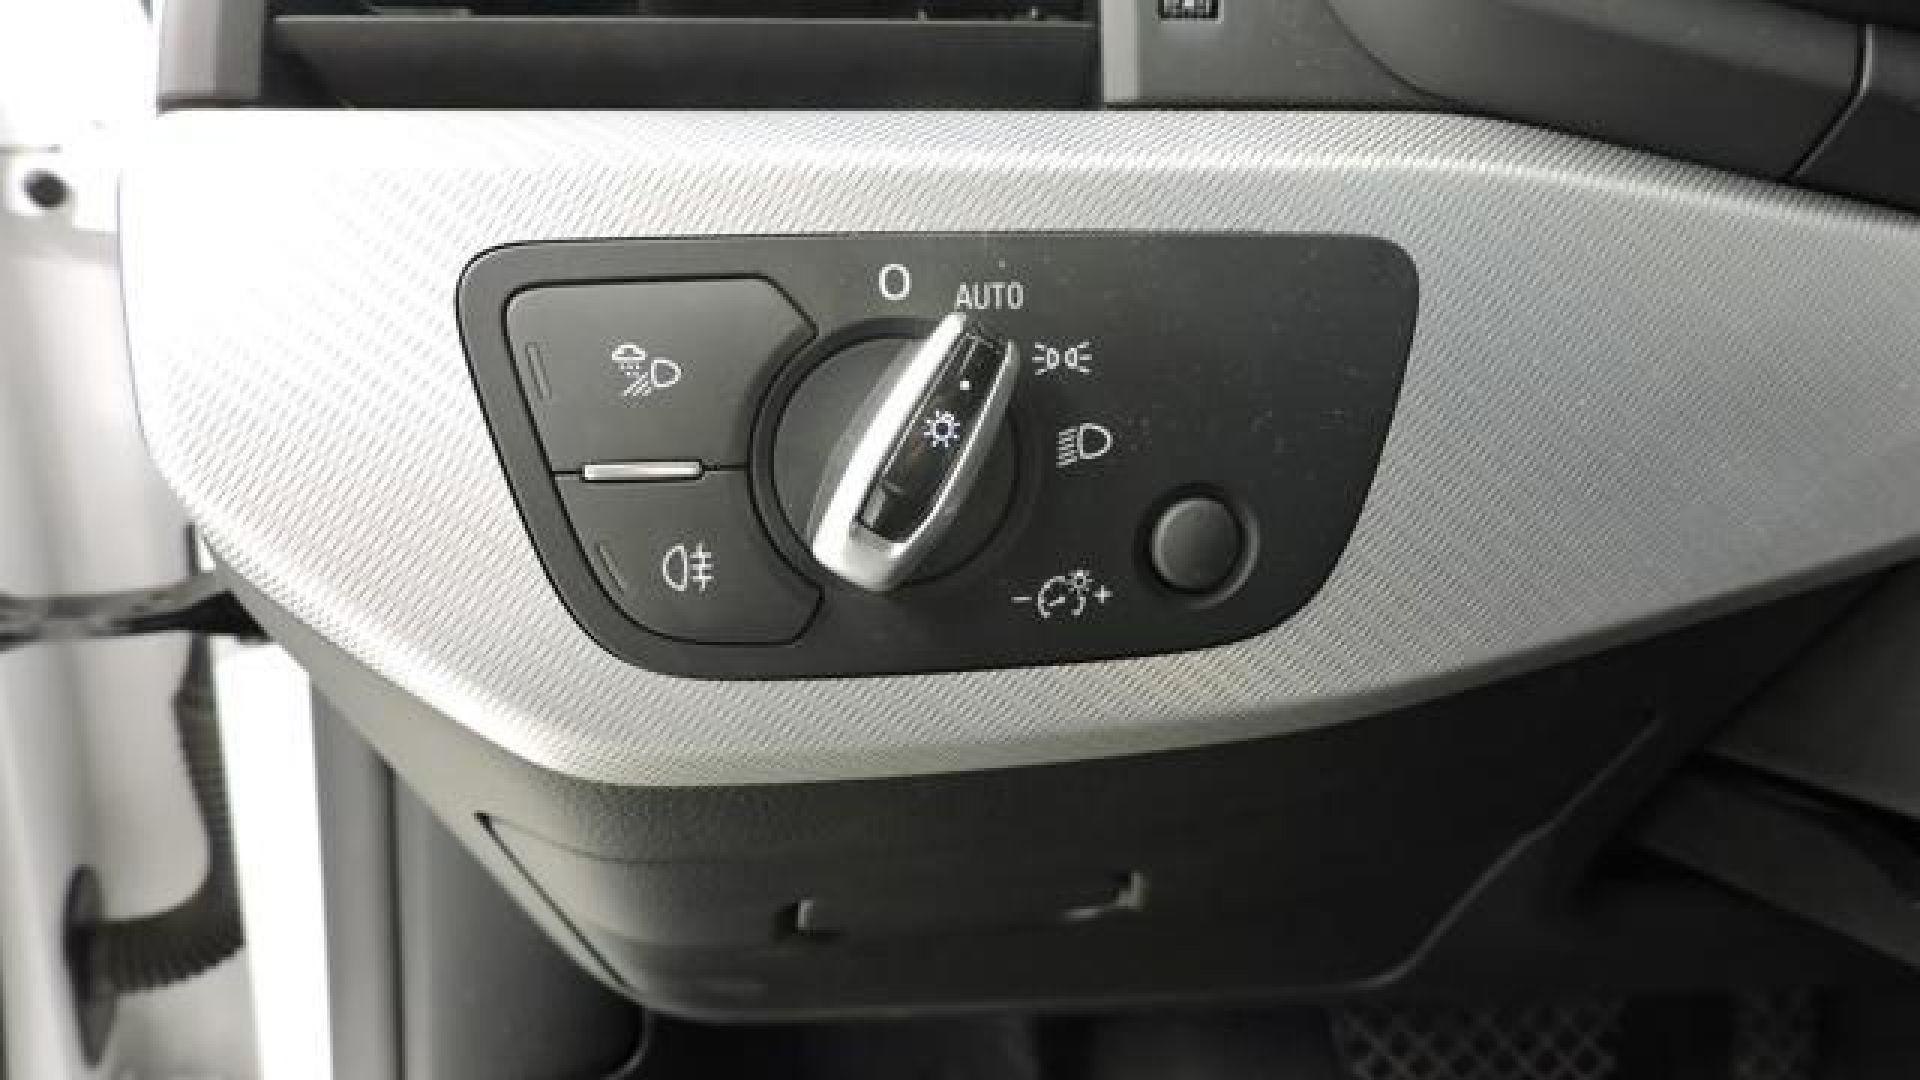 Audi A5 Sportback sport 3.0 TDI quattro 160 kW (218 CV) S tronic